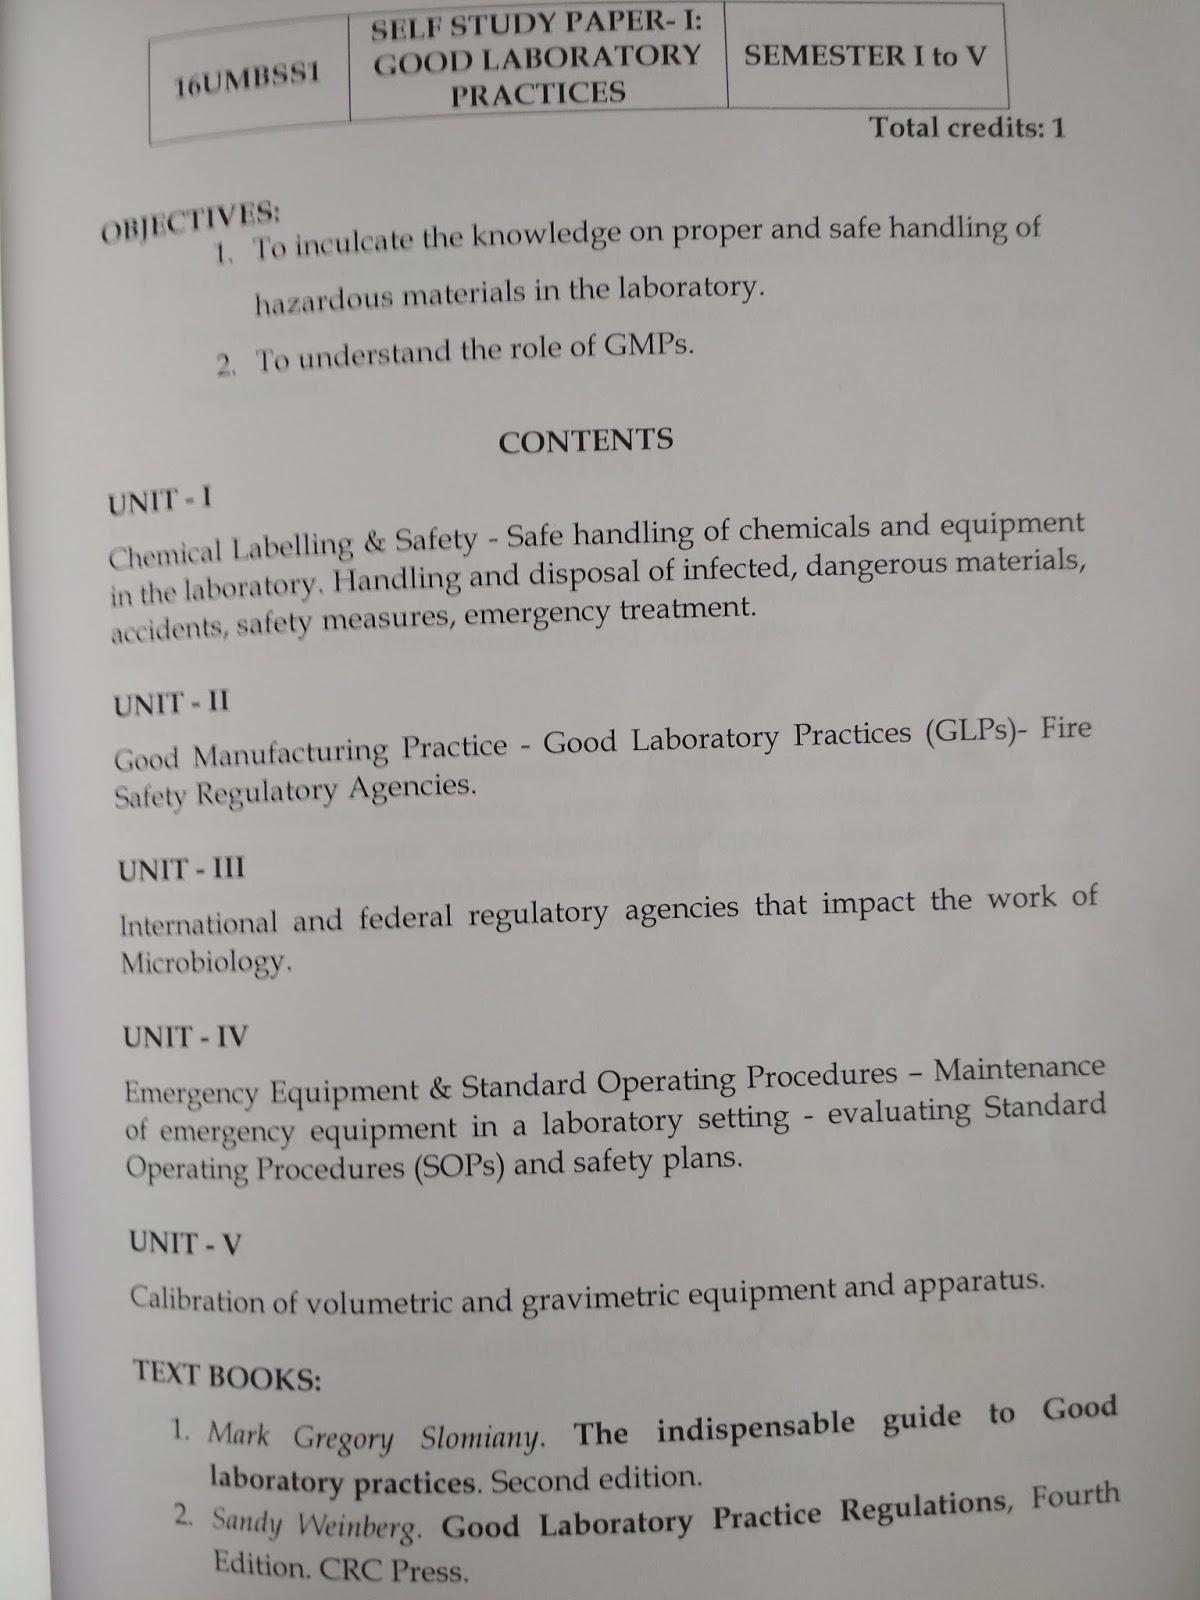 senthil prabhu sivasamy self study paper syllabus good self study paper syllabus good laboratory practices